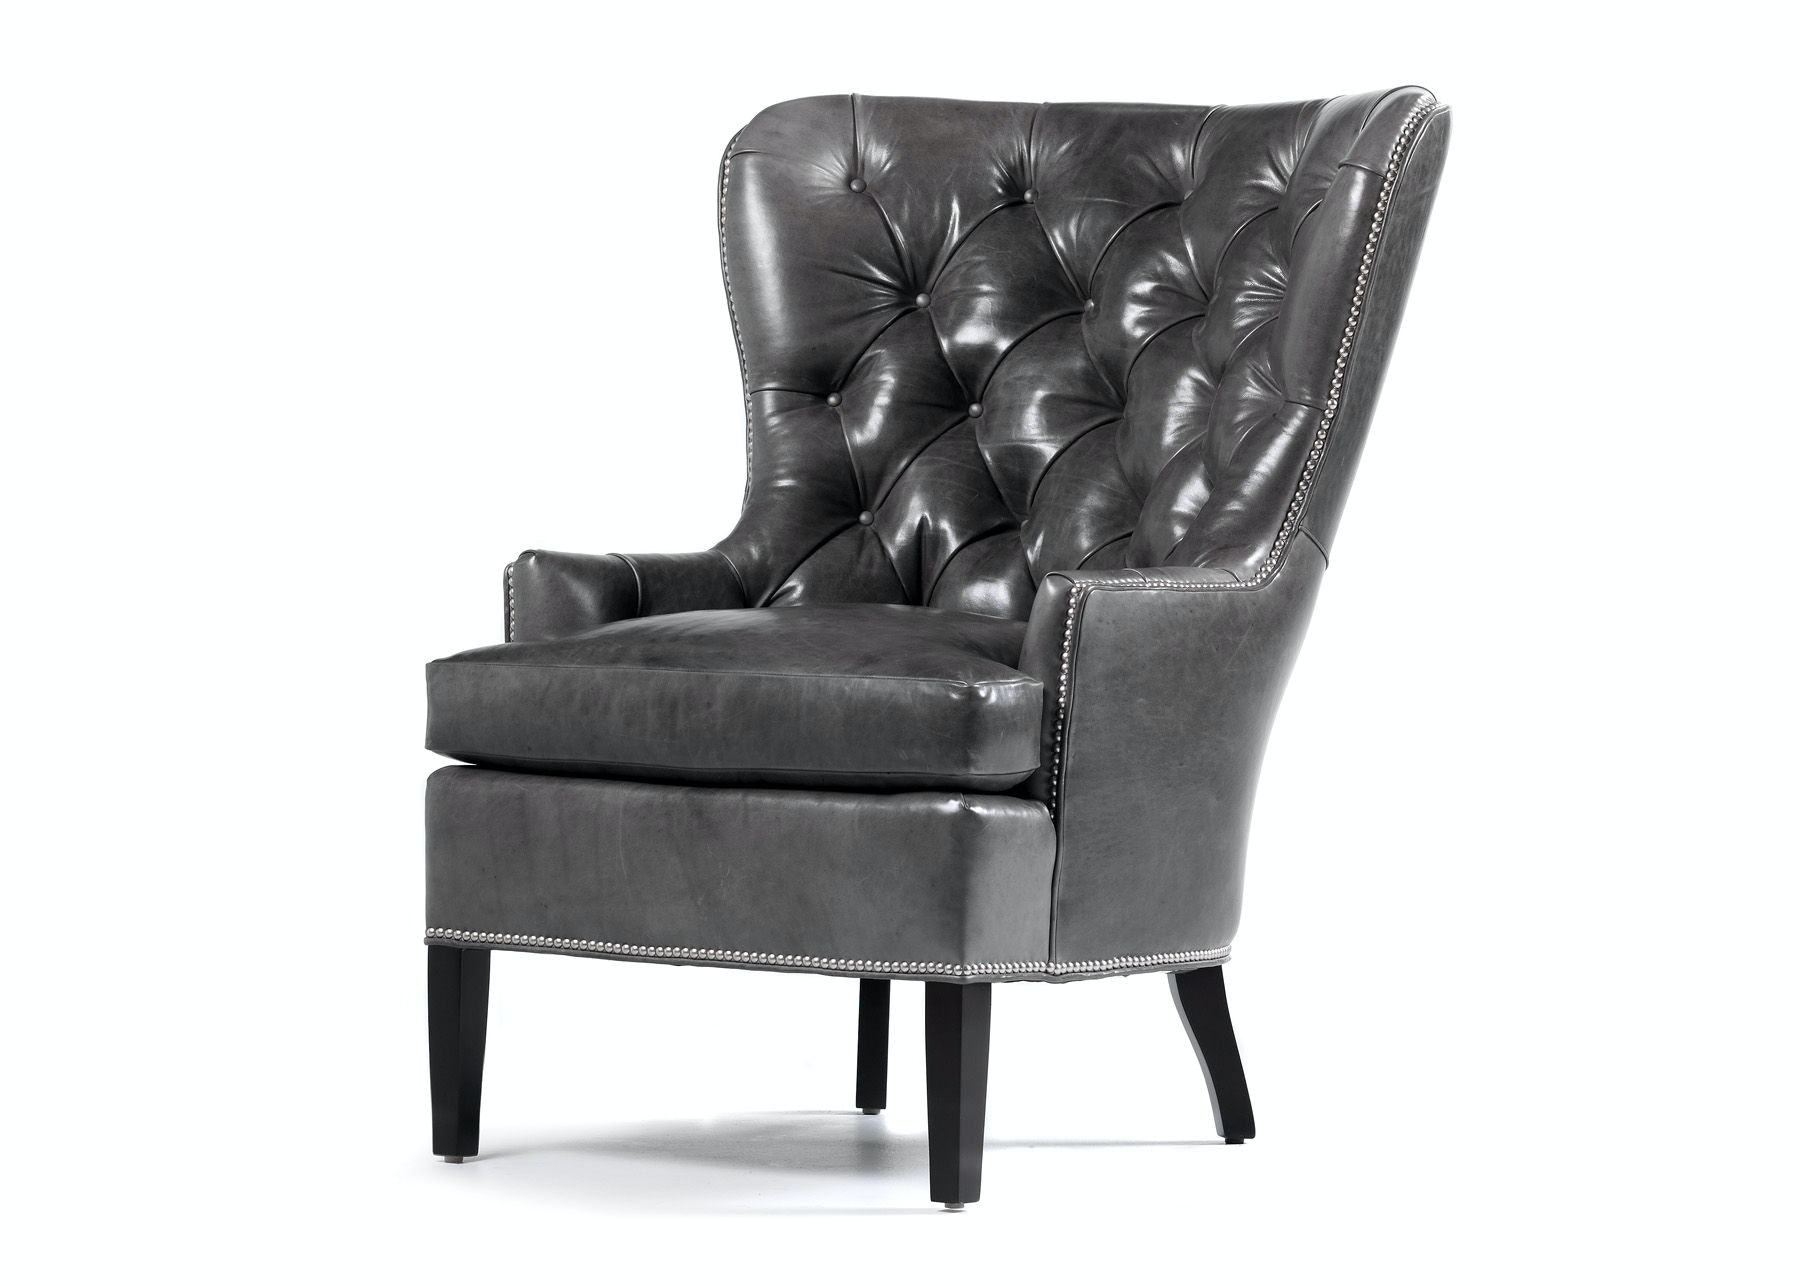 jessica charles chairs portable beach hammock chair living room chilton tufted 629